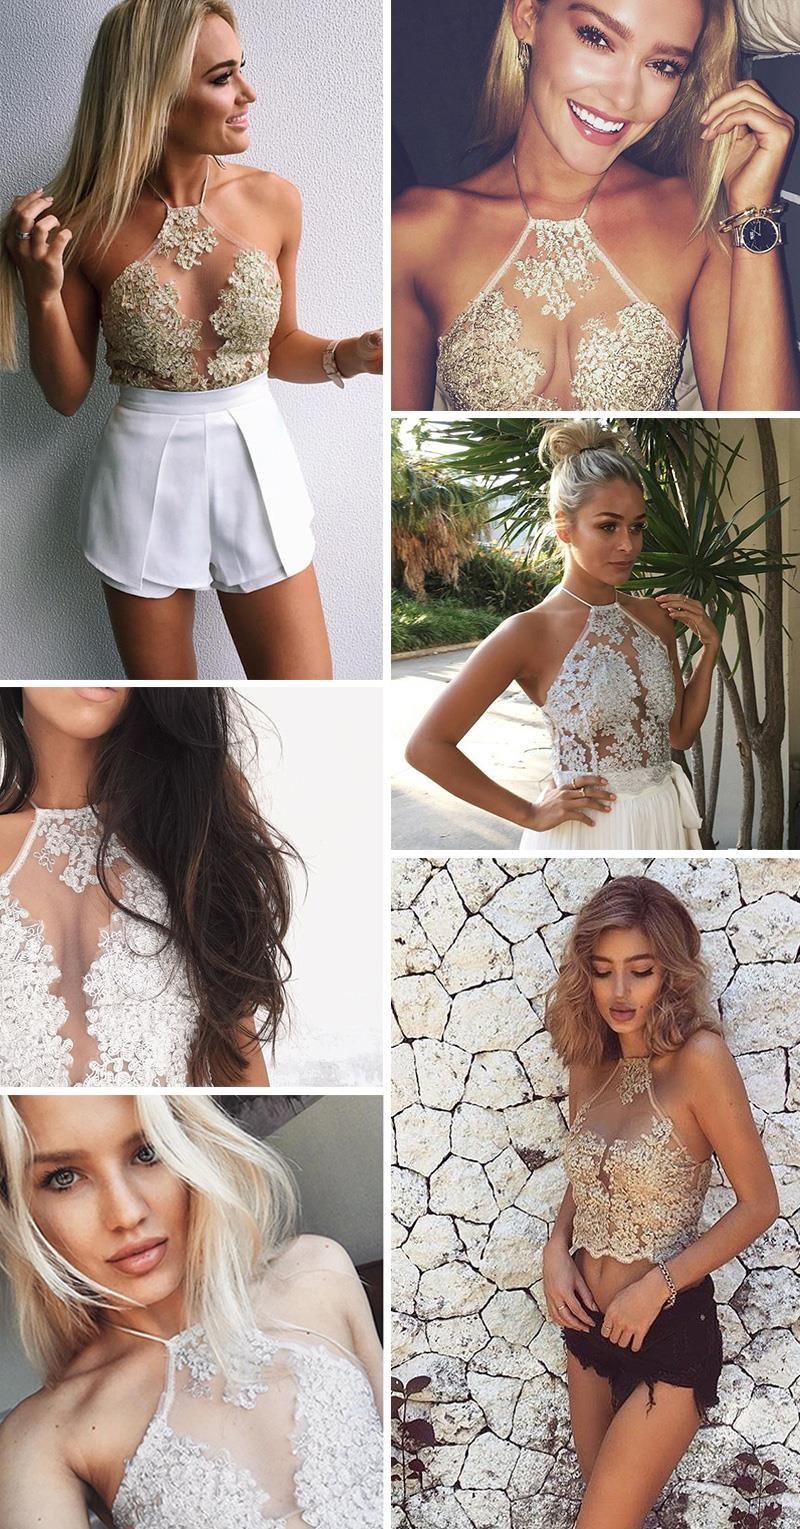 HTB1lQfnJVXXXXcgXpXXq6xXFXXXt - Summer Women Lace Crop Tops Elegant JKP023